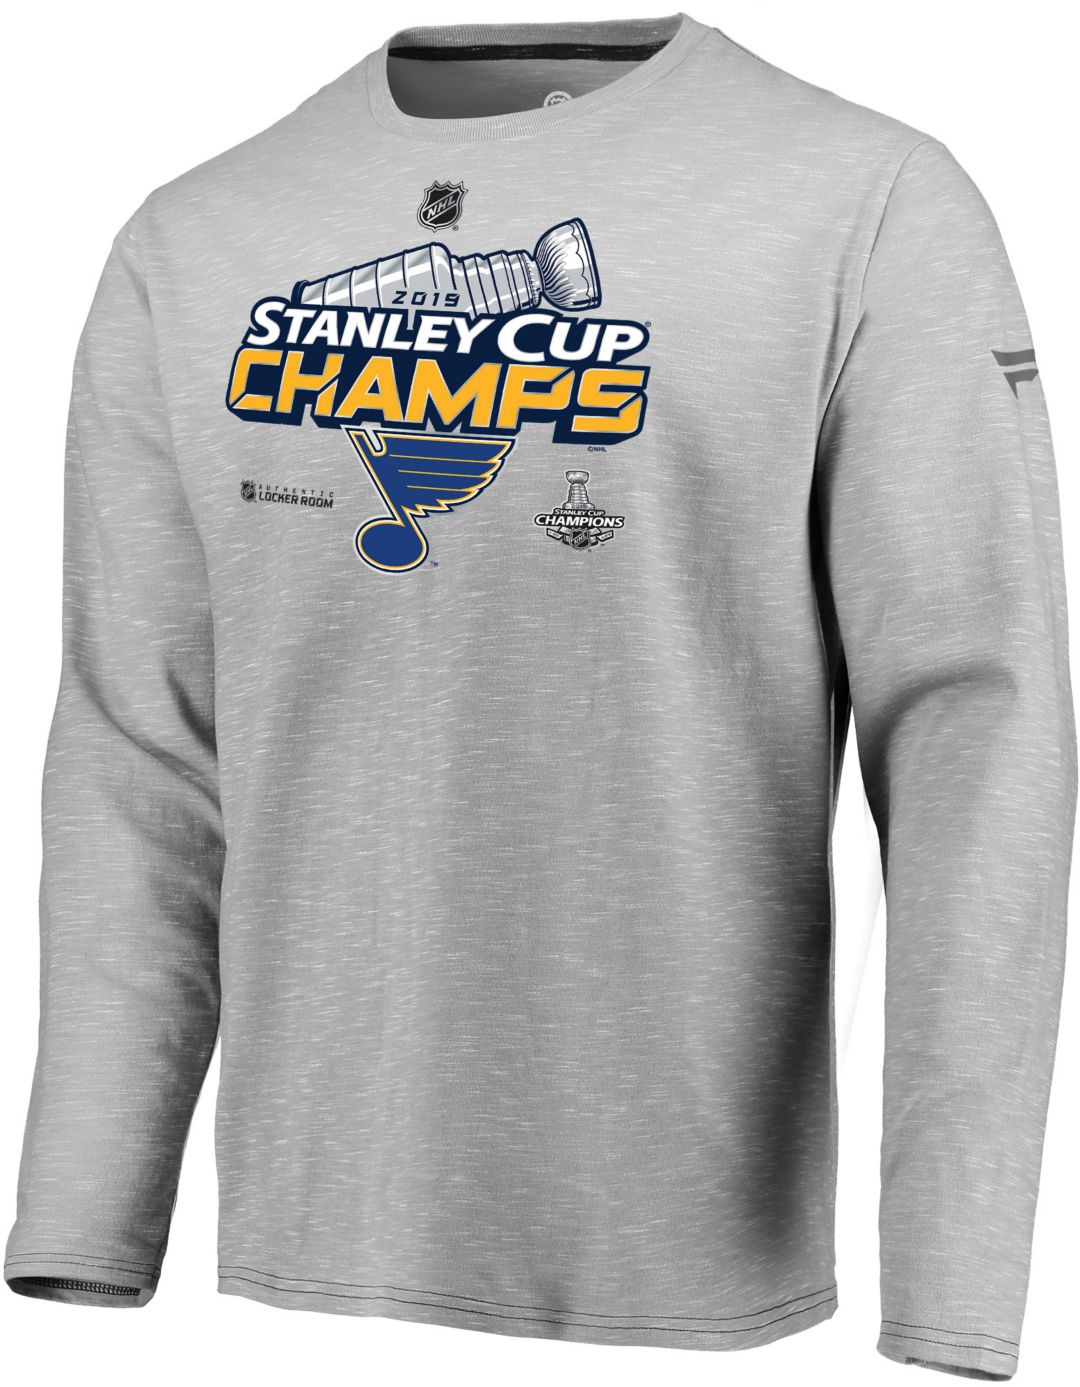 8d60a880290 NHL Men's 2019 Stanley Cup Champions St. Louis Blues Locker Room Long  Sleeve Shirt 1